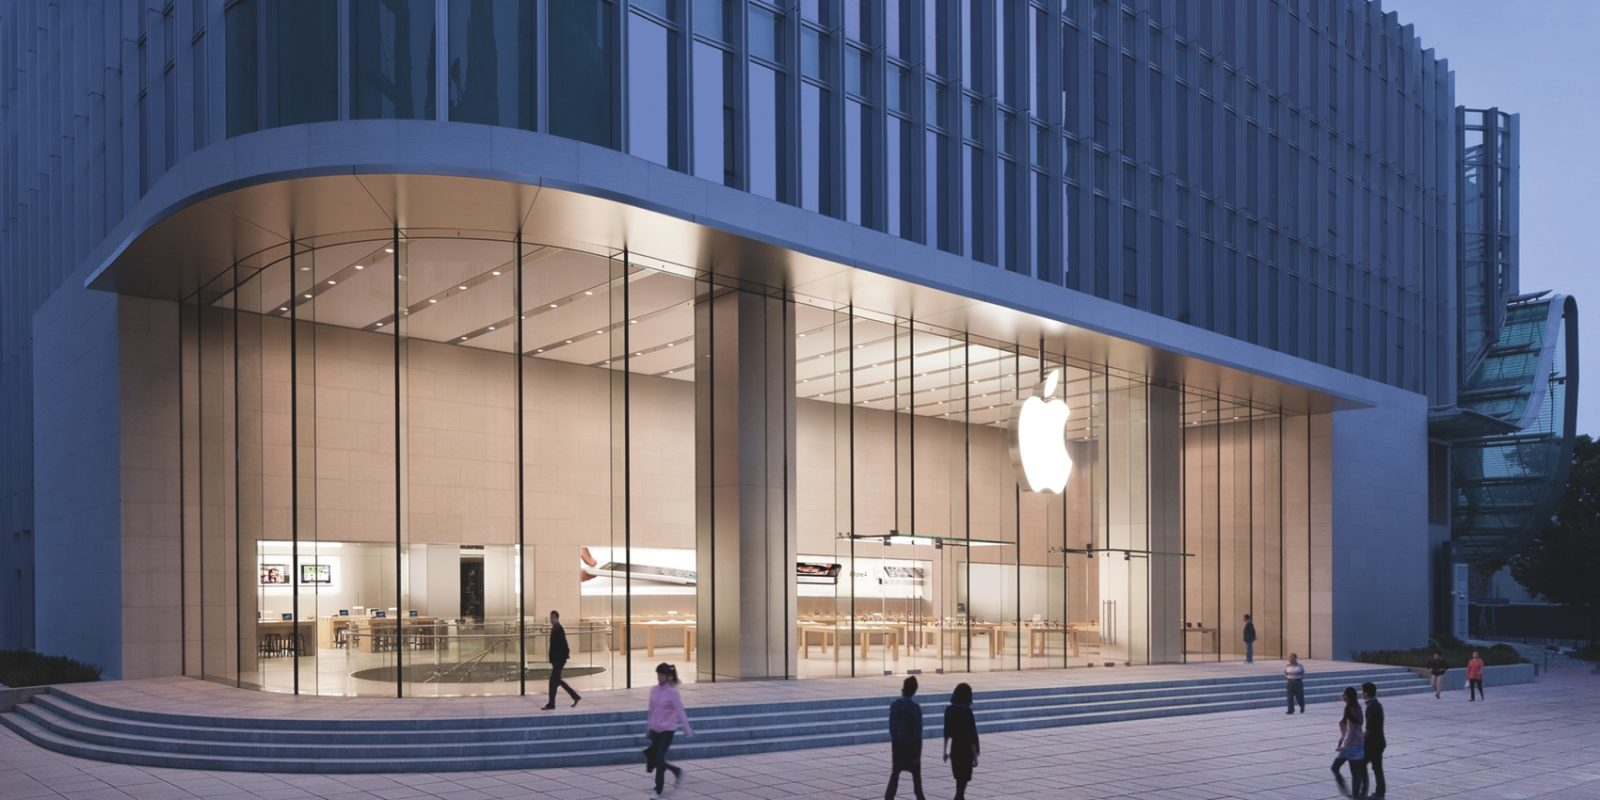 Apple can reach $1 trillion again if it launches a